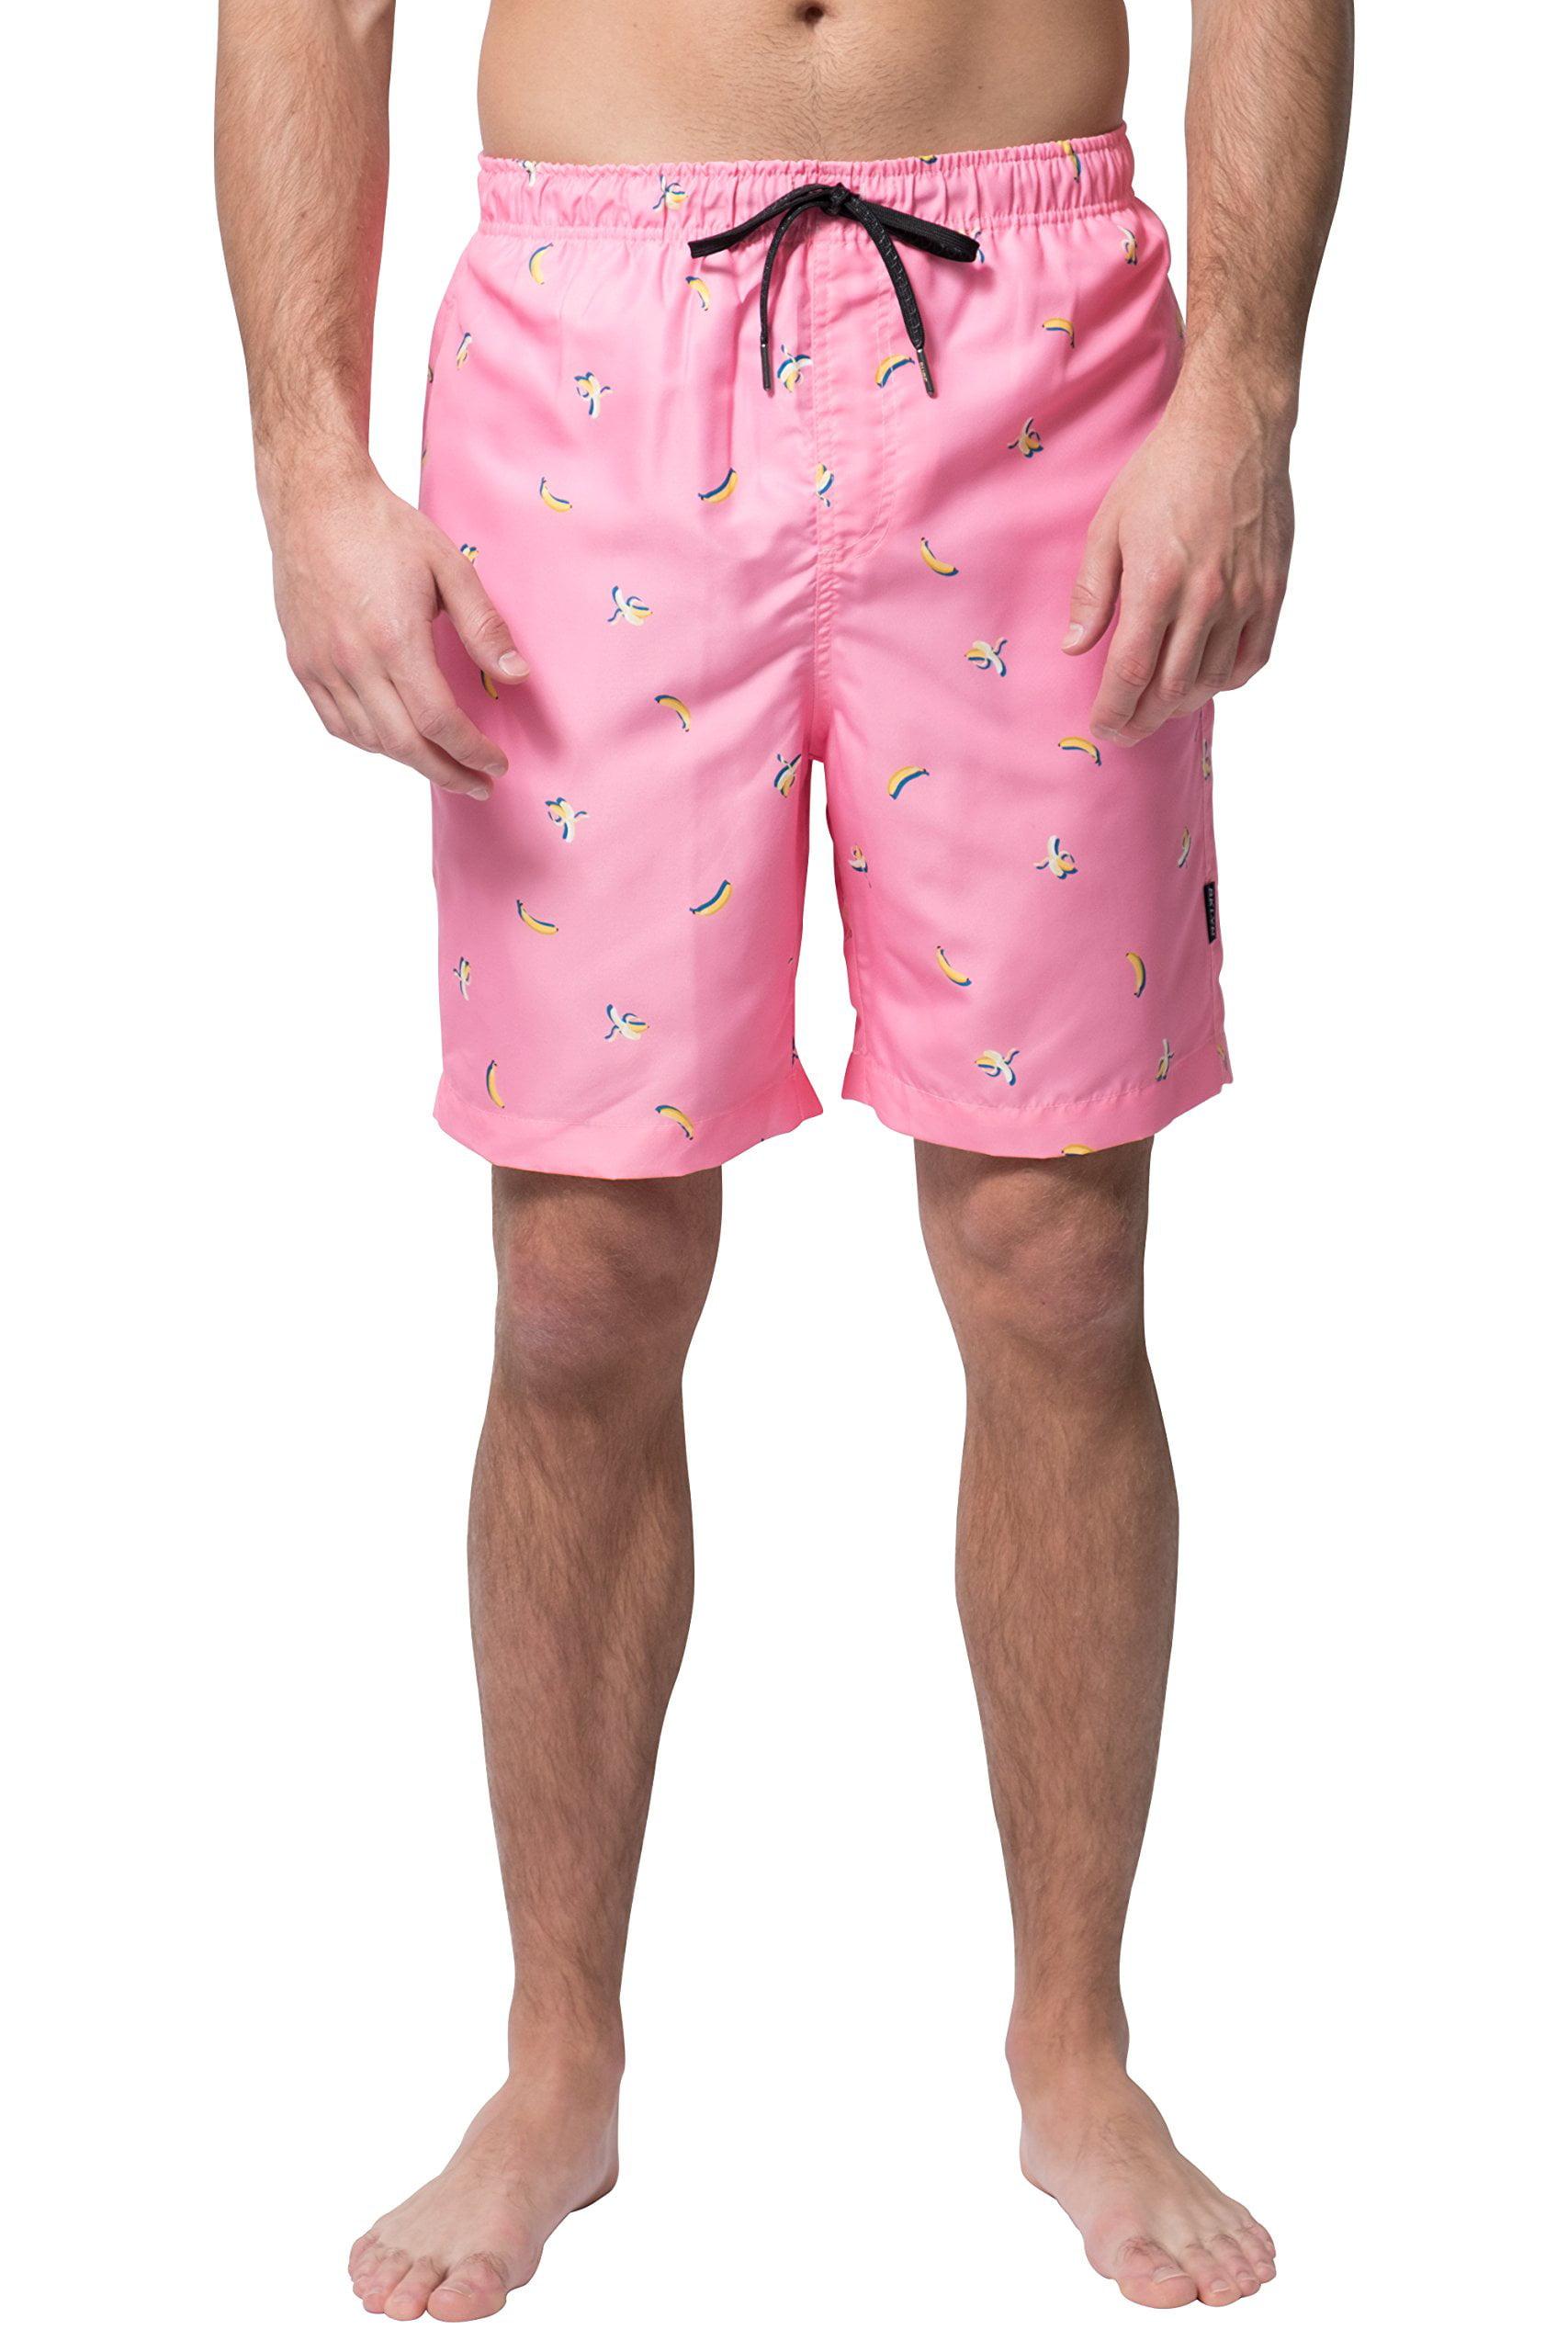 DDYJ Paint Splatters Boardshorts Mens Swimtrunks Fashion Beach Shorts Casual Shorts Swim Trunks